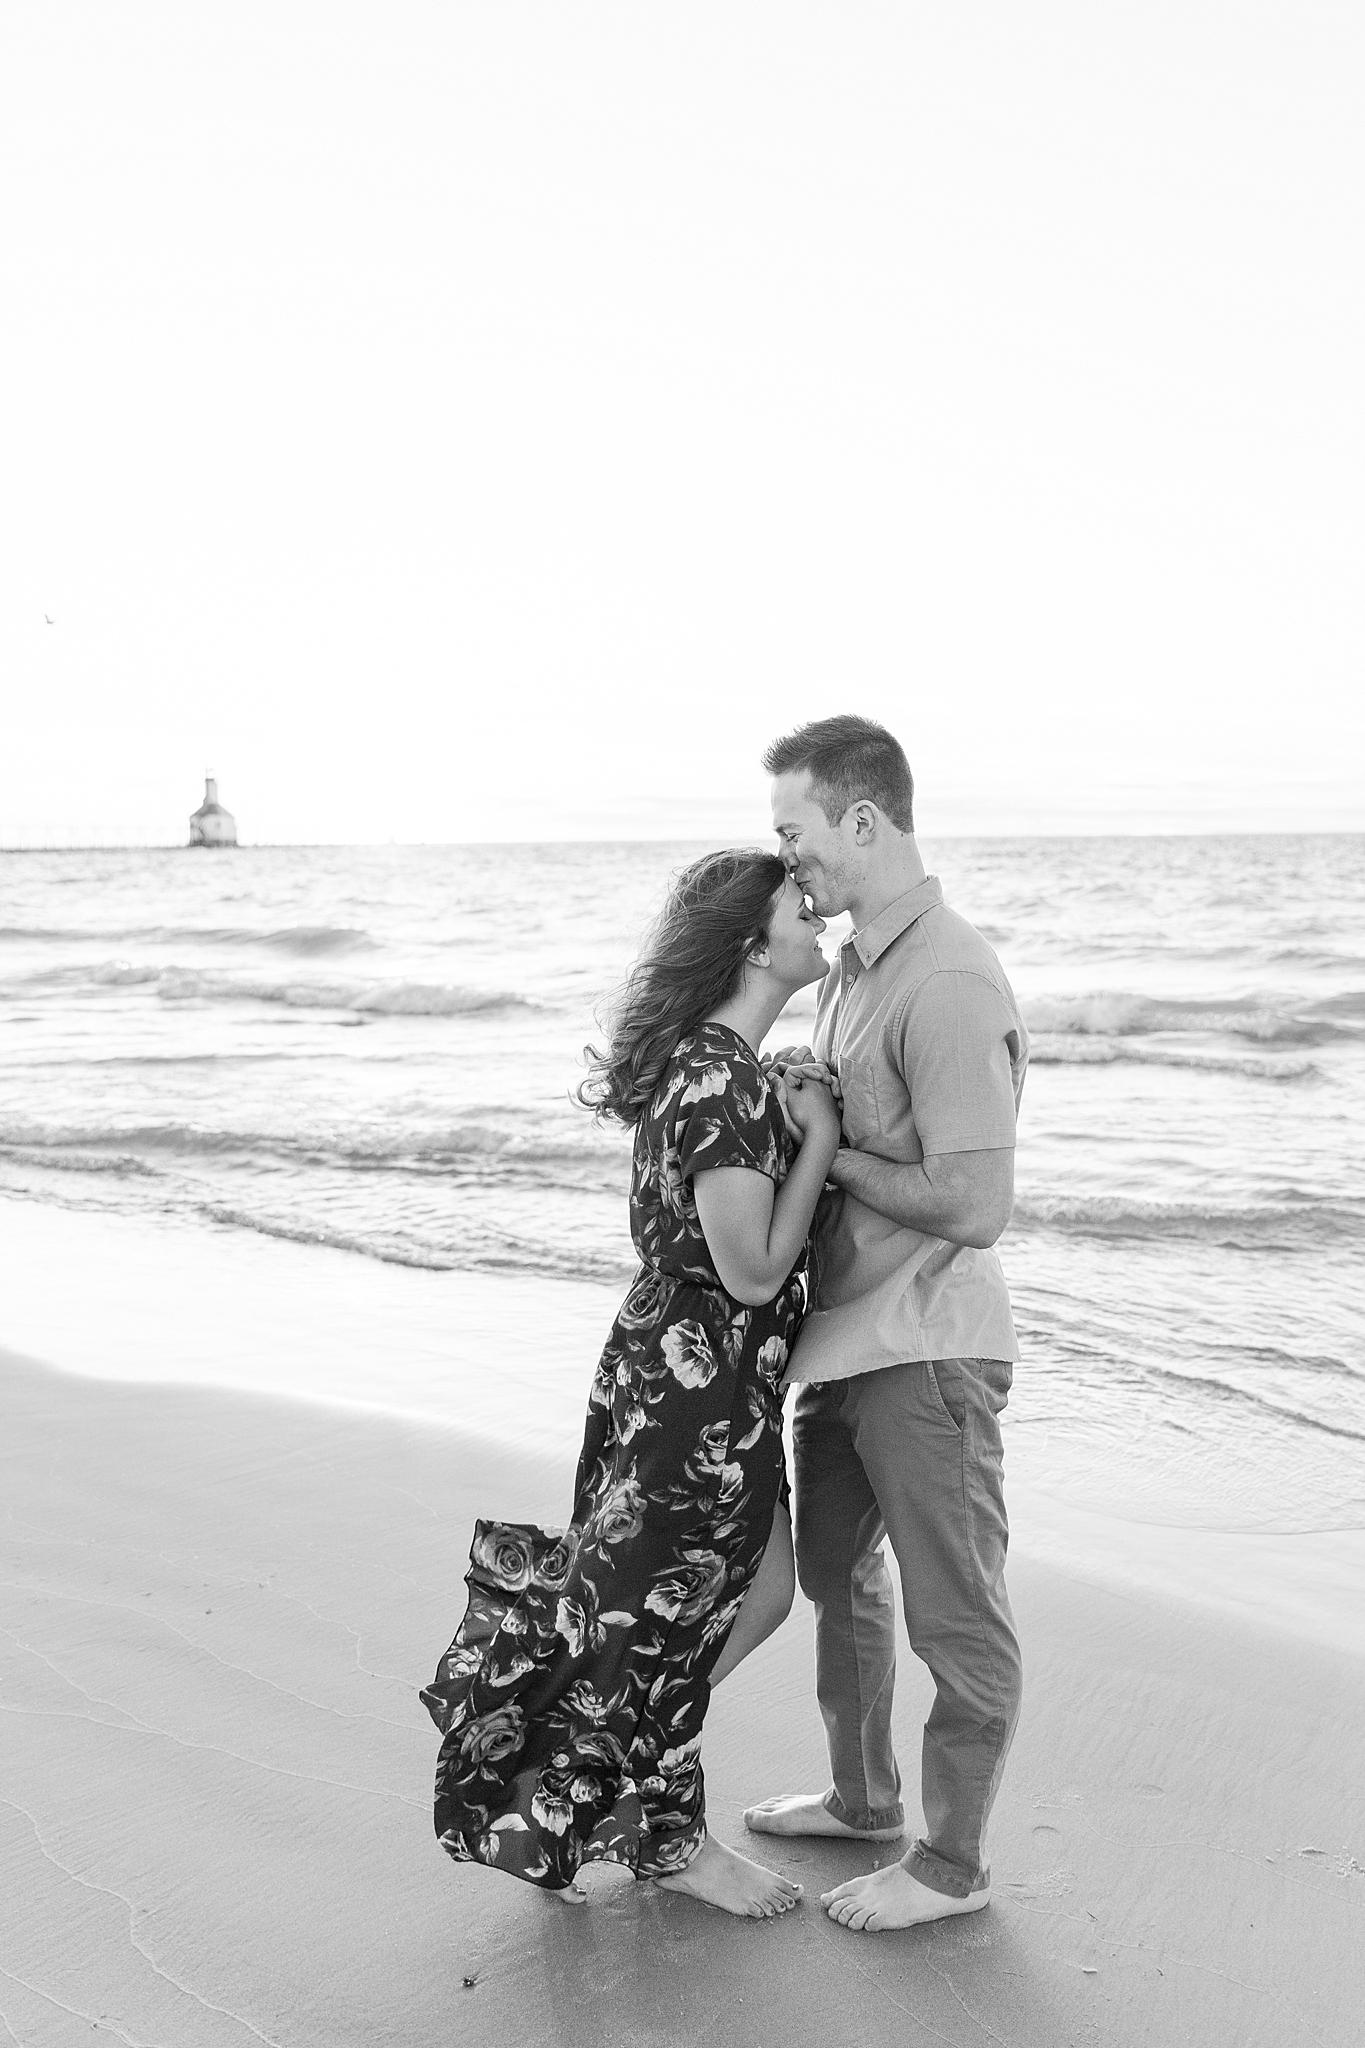 romantic--summer-beach-engagement-photography-in-st-joseph-mi-by-courtney-carolyn-photography_0013.jpg